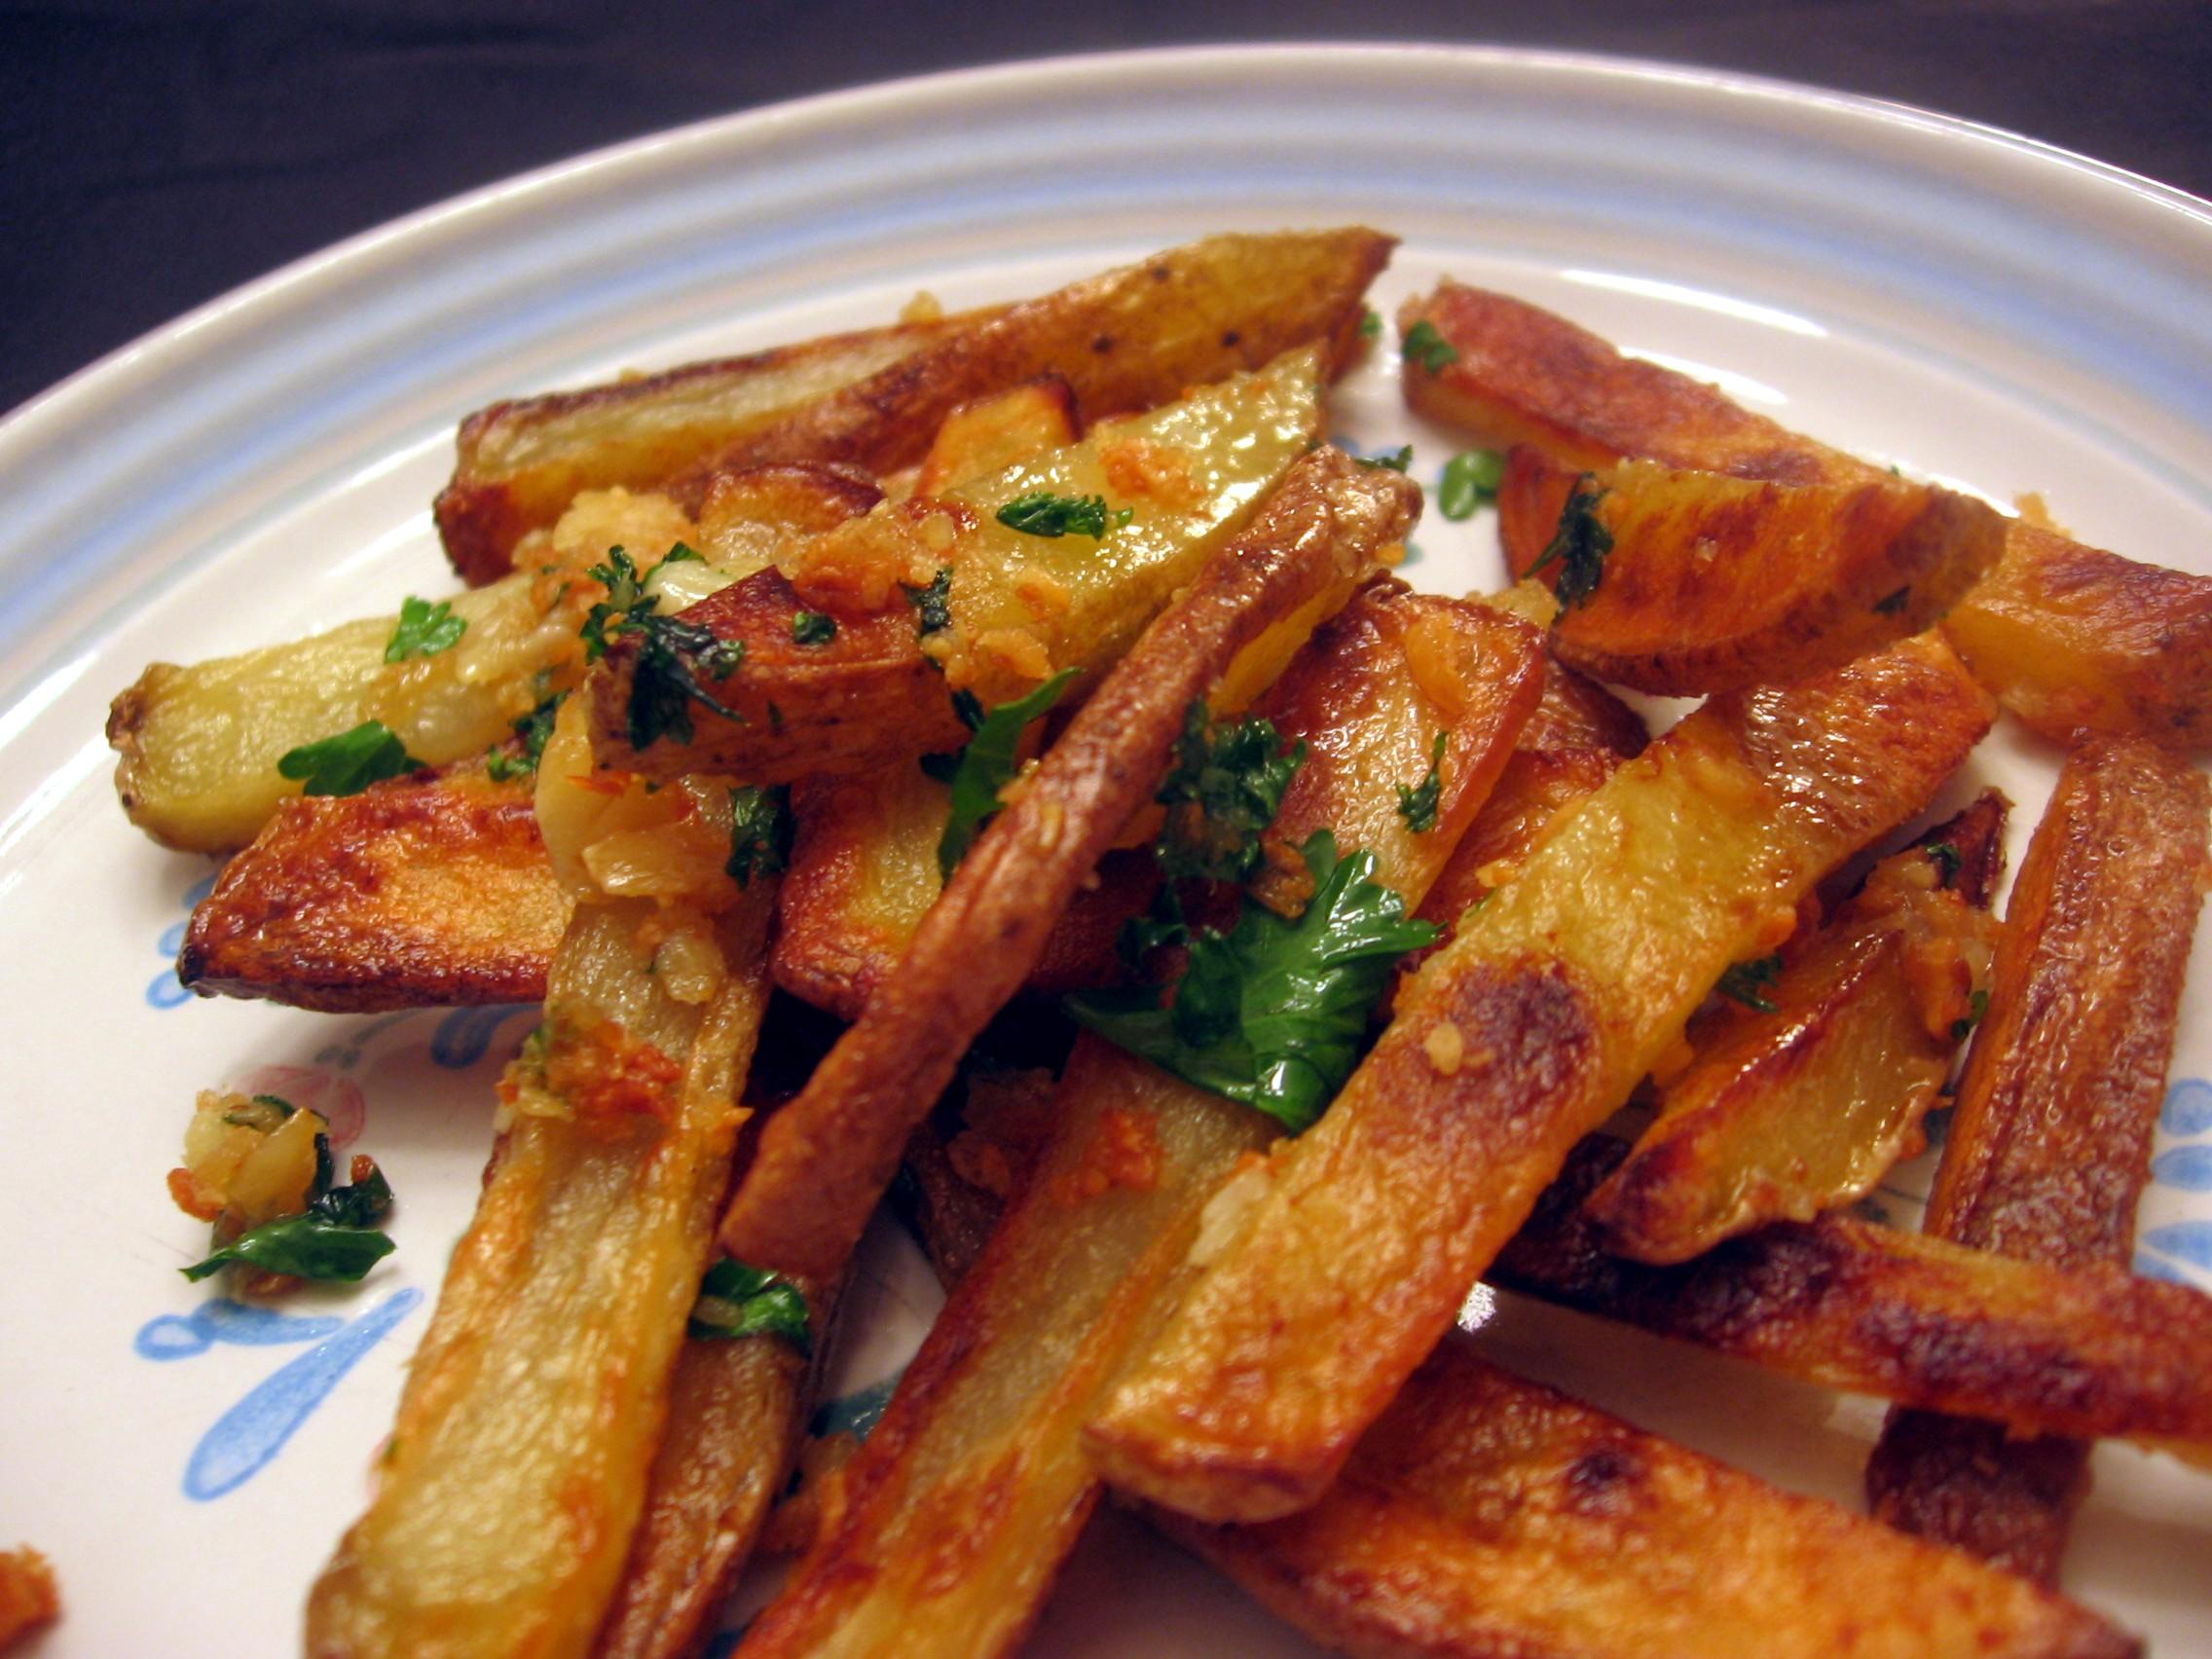 Garlic Fries (Light)